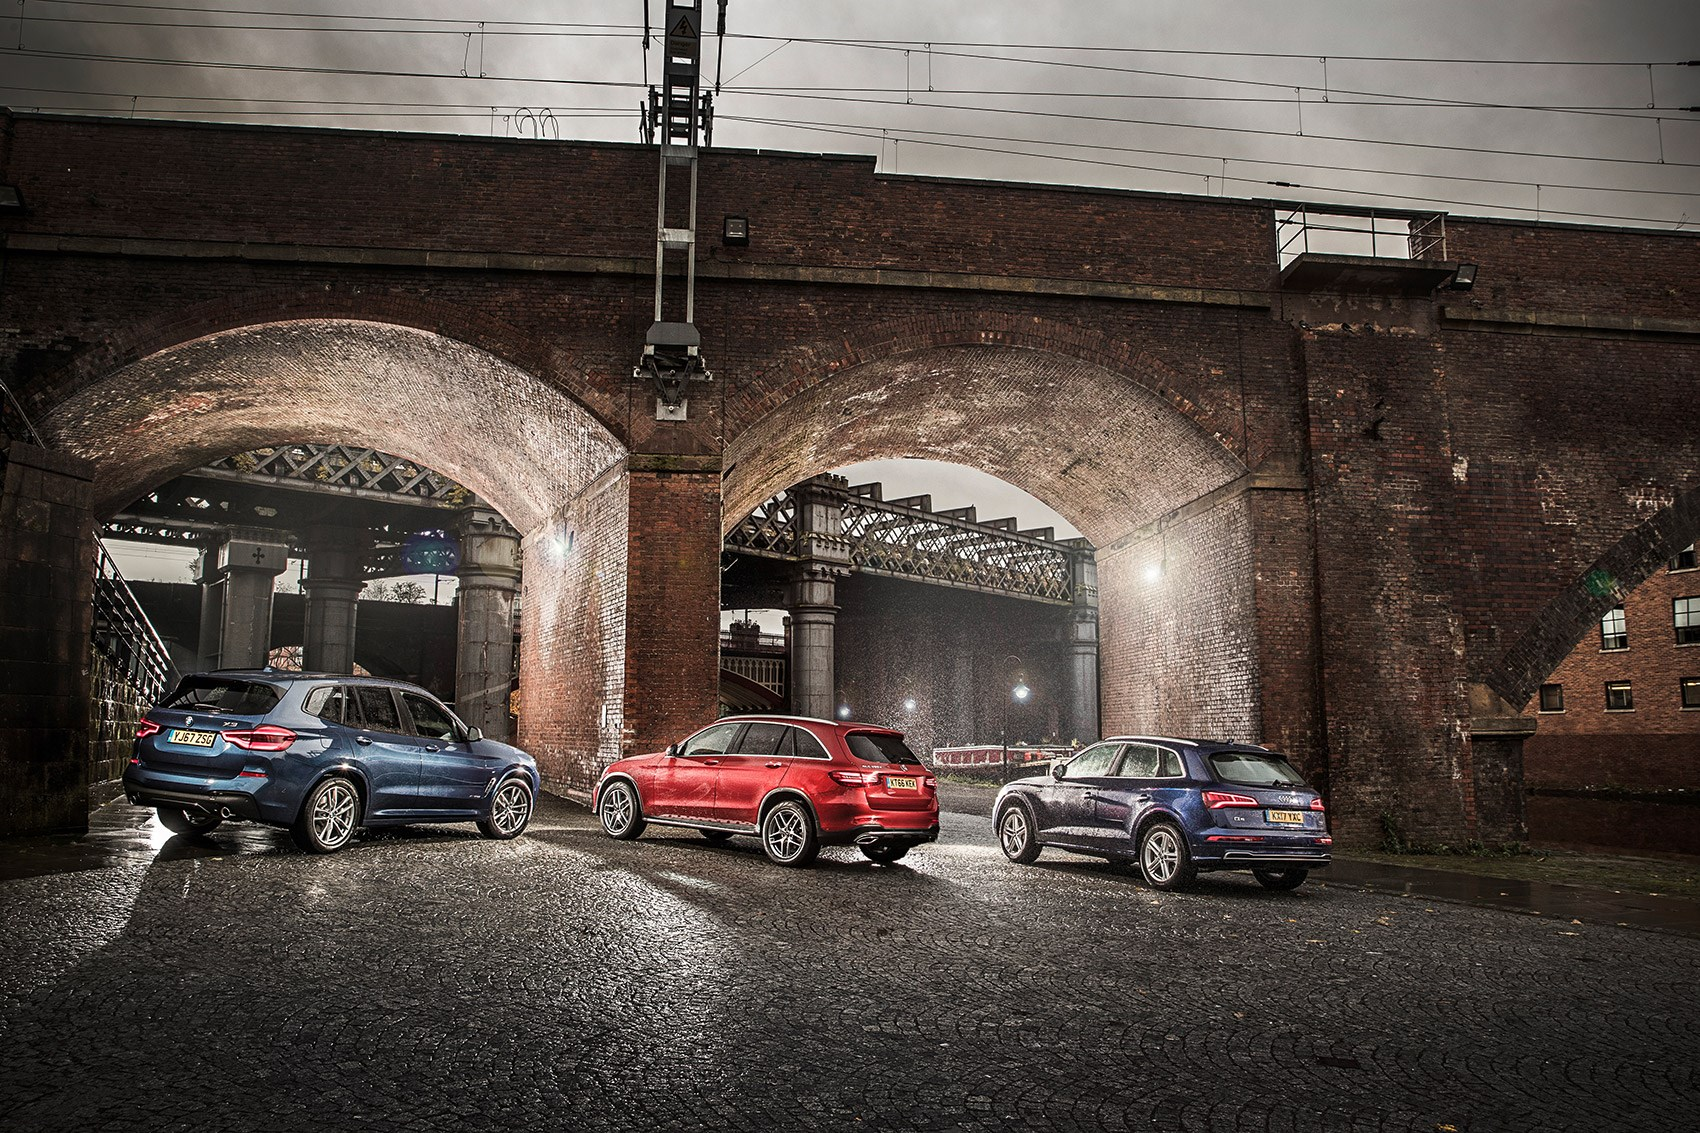 New Bmw X3 Vs Audi Q5 Vs Mercedes Glc Triple Test Review 2018 Car Magazine